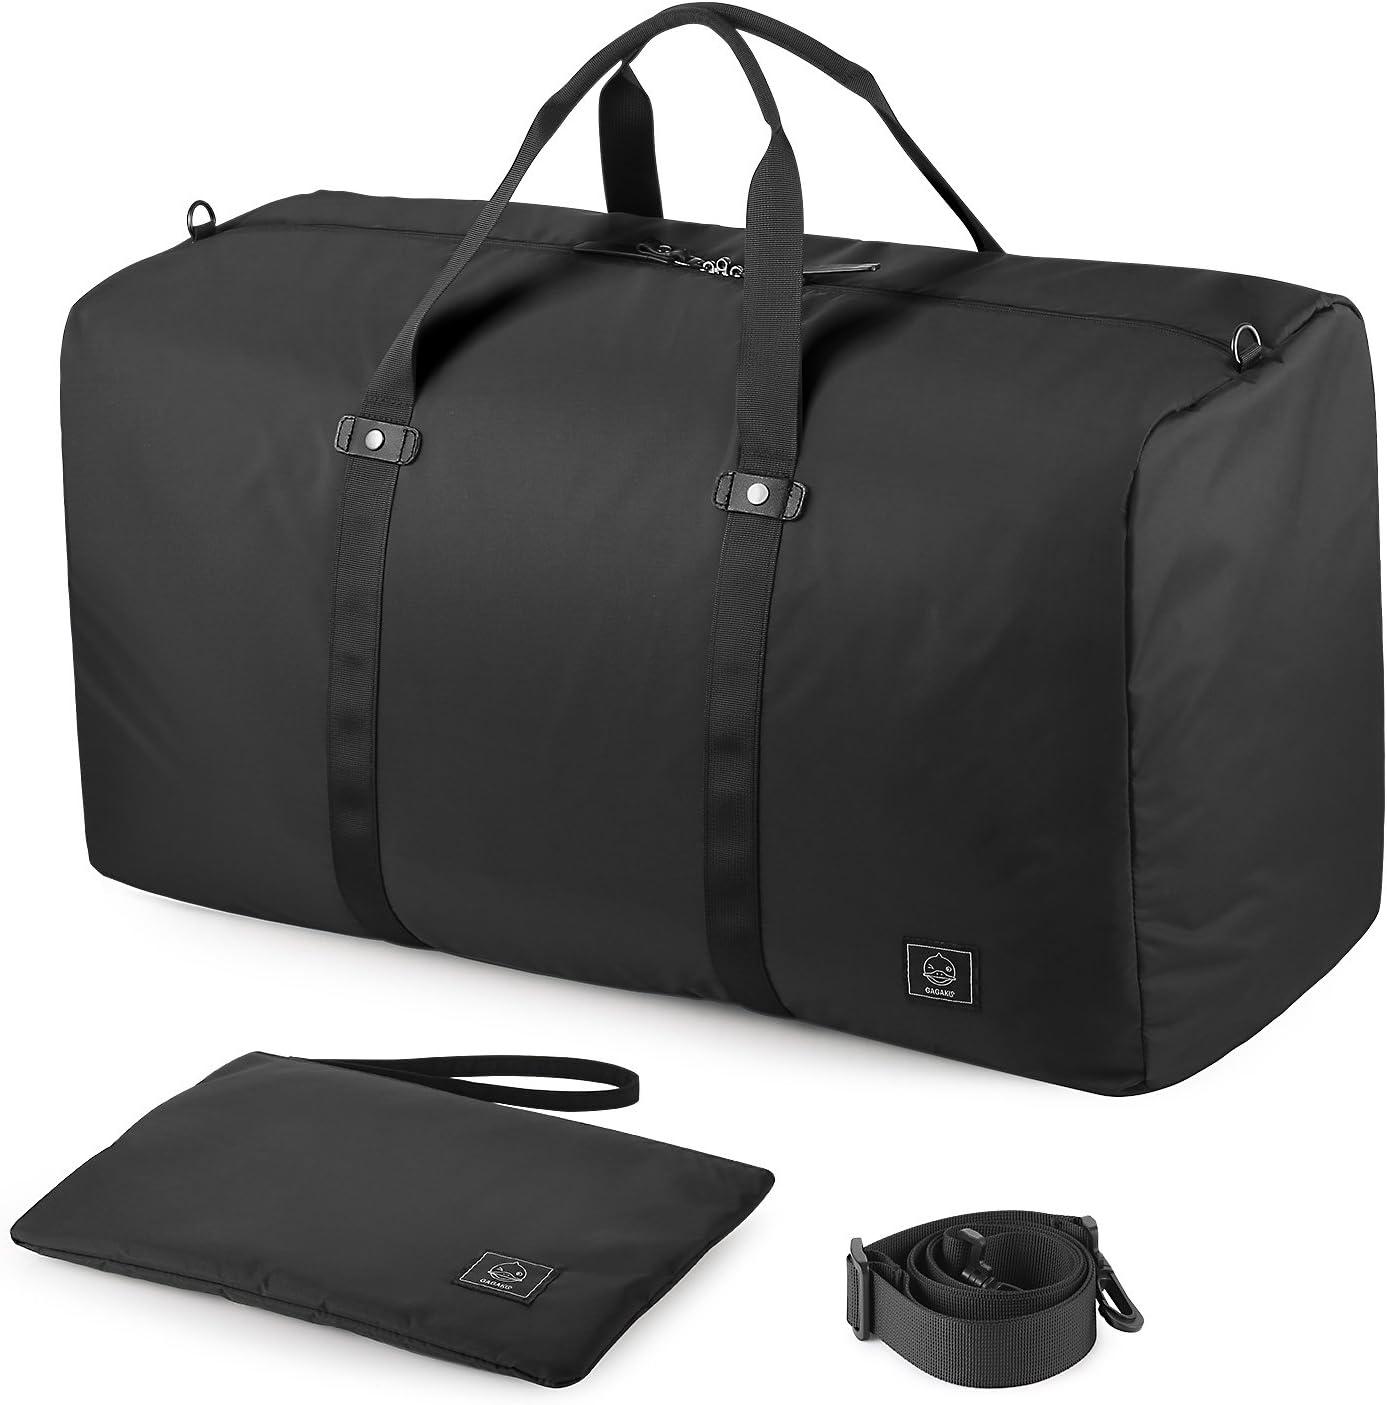 GAGAKU 80L Bolsa de Viaje Plegable Bolsas Grande Duffel Bag para Avión Cabina Impermeable Nylon XXL - Negro